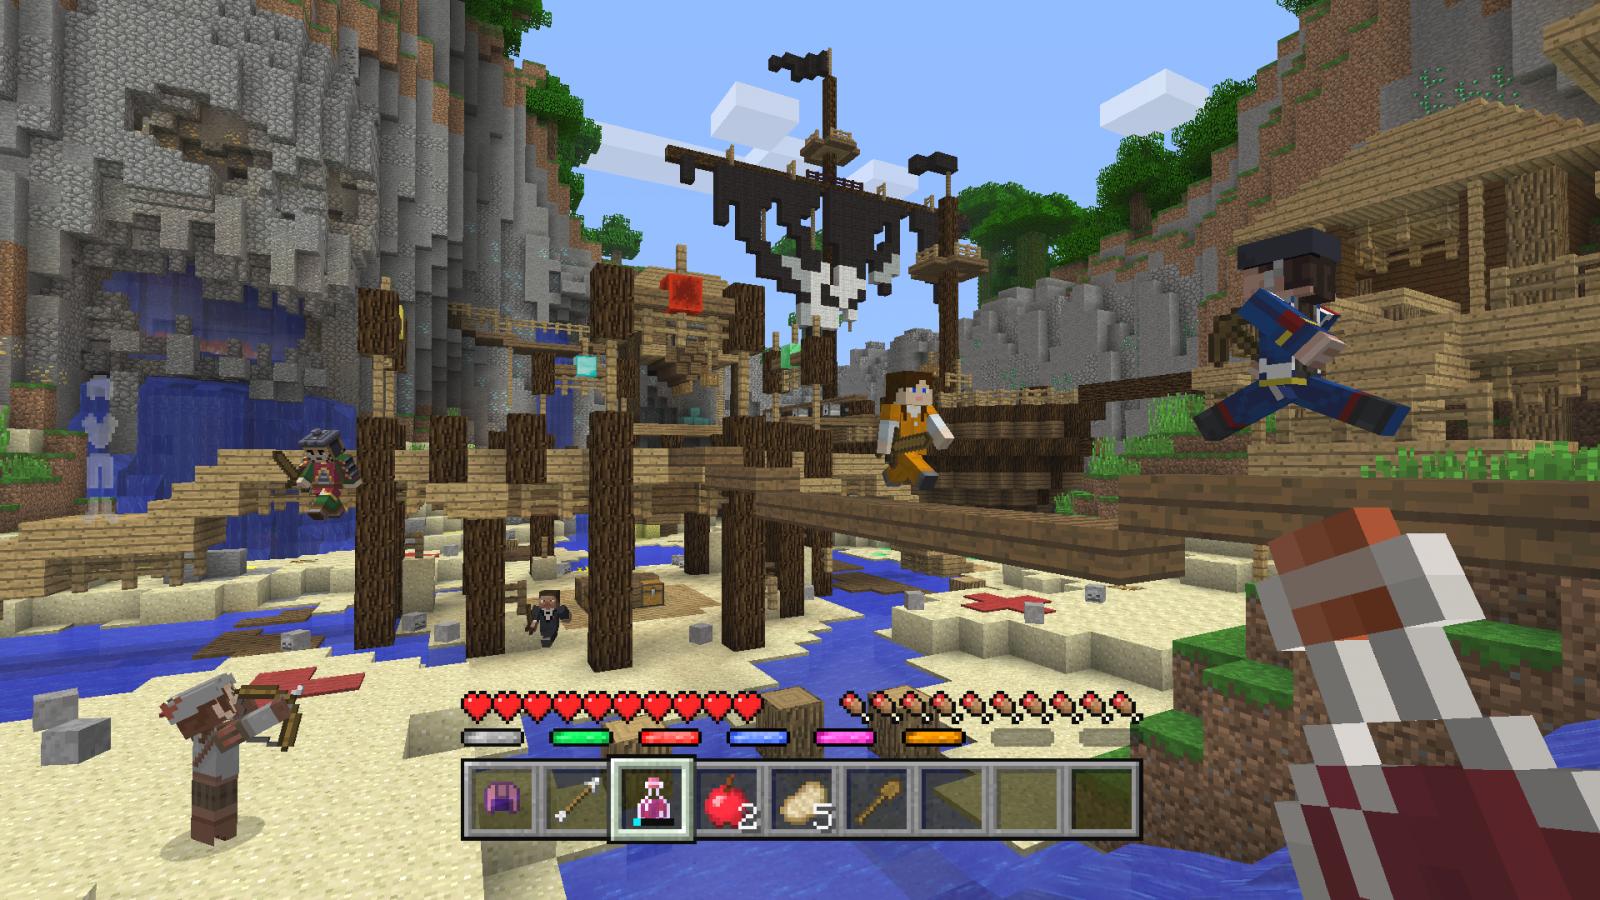 Minecraft Battle Deathmatch Mode